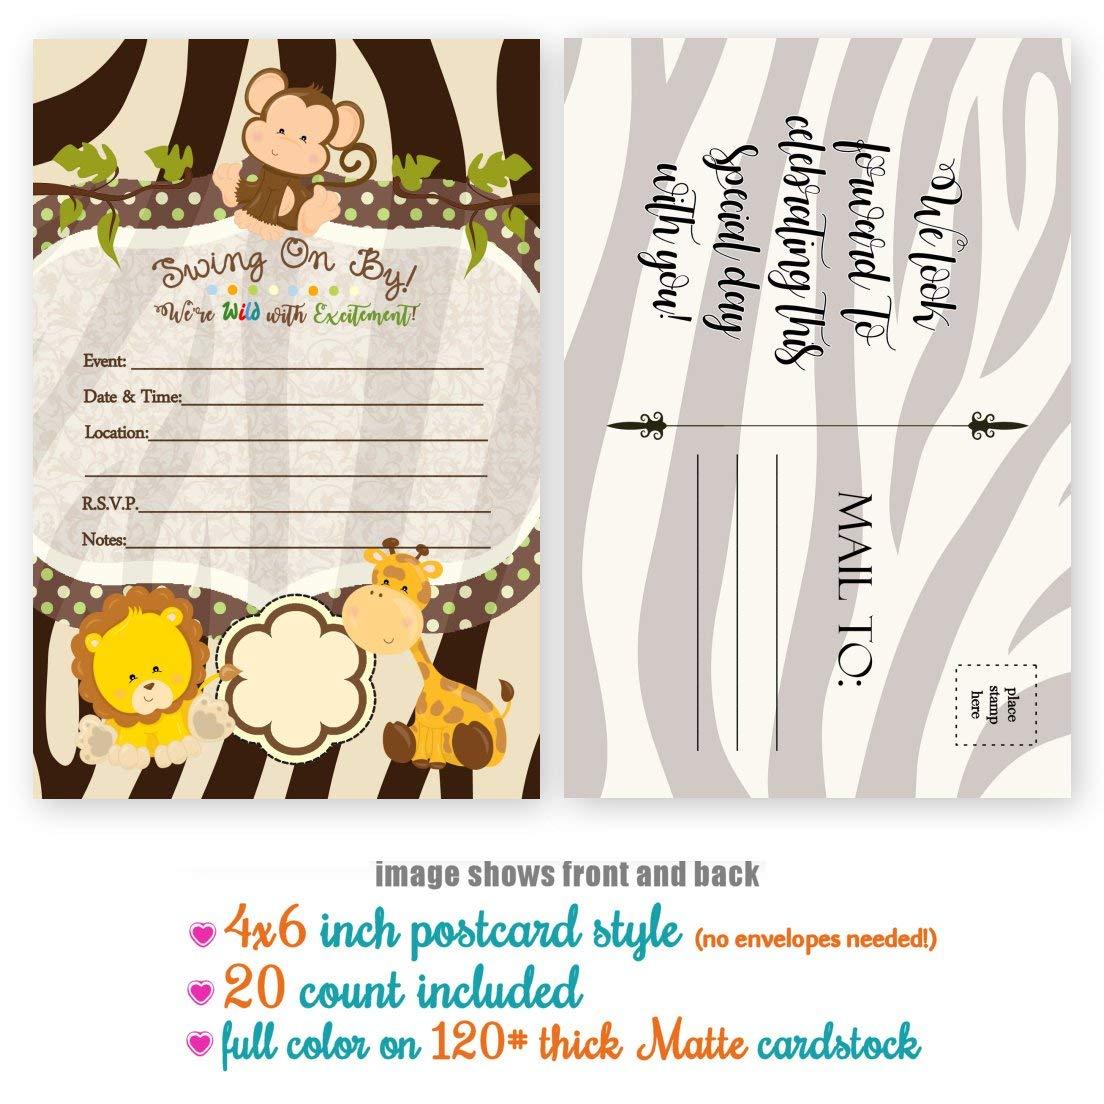 Amazon Monkey Birthday Invitations Jungle Baby Shower Invitation 20 Count 4x6 Inch Postcard Fill In The Blank Handmade